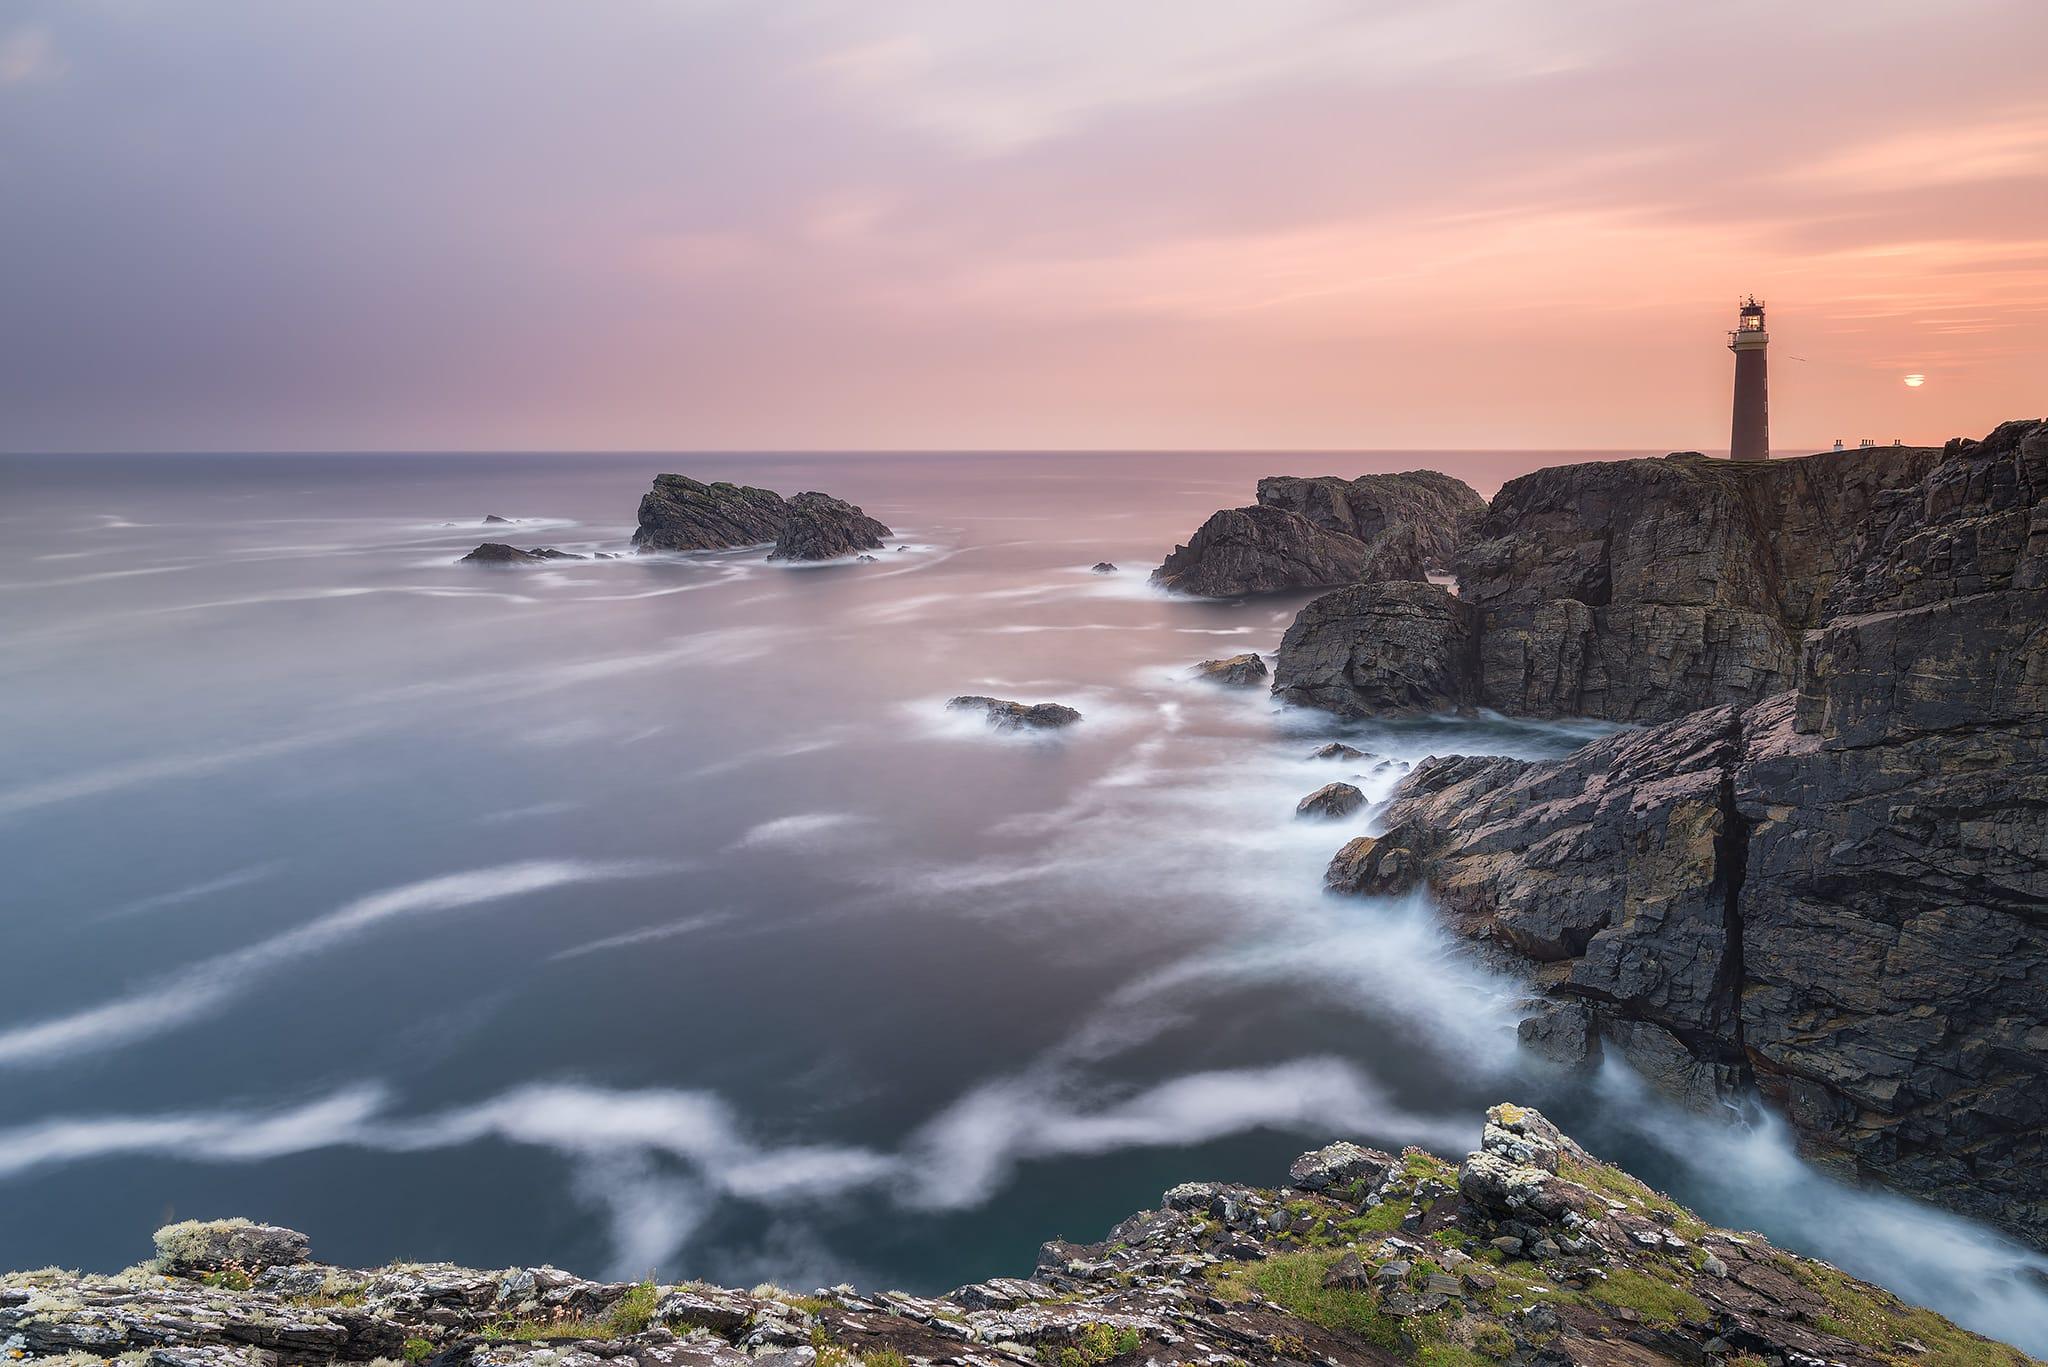 Francesco Gola Seascape Long Exposure Fine Art Photography Butt Lewis Lighthouse Outer Hebrides Scotland UK Sunrise Warm